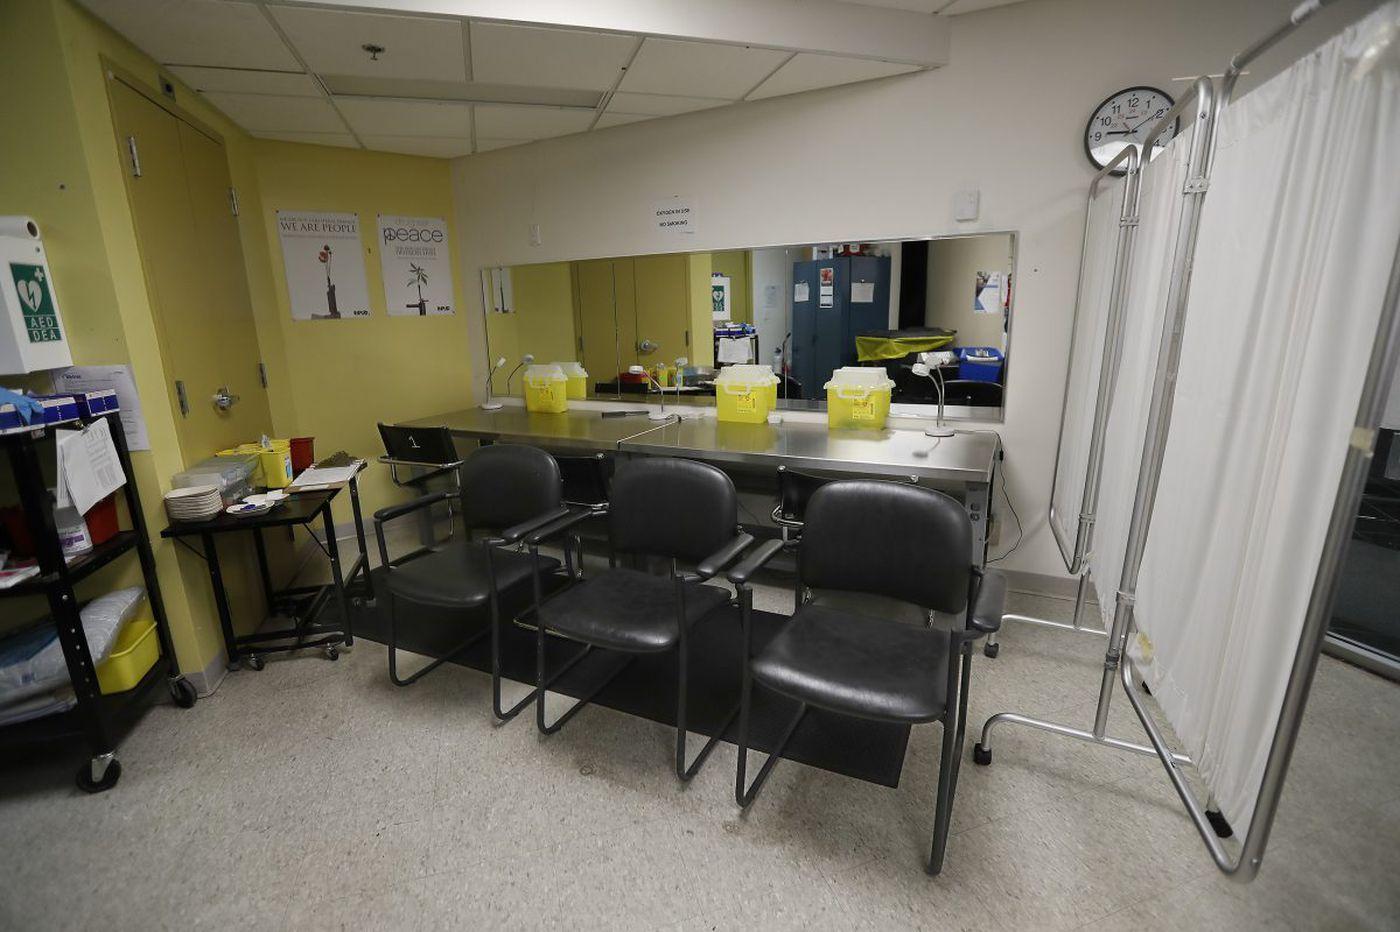 San Francisco announces plans to open safe injection sites